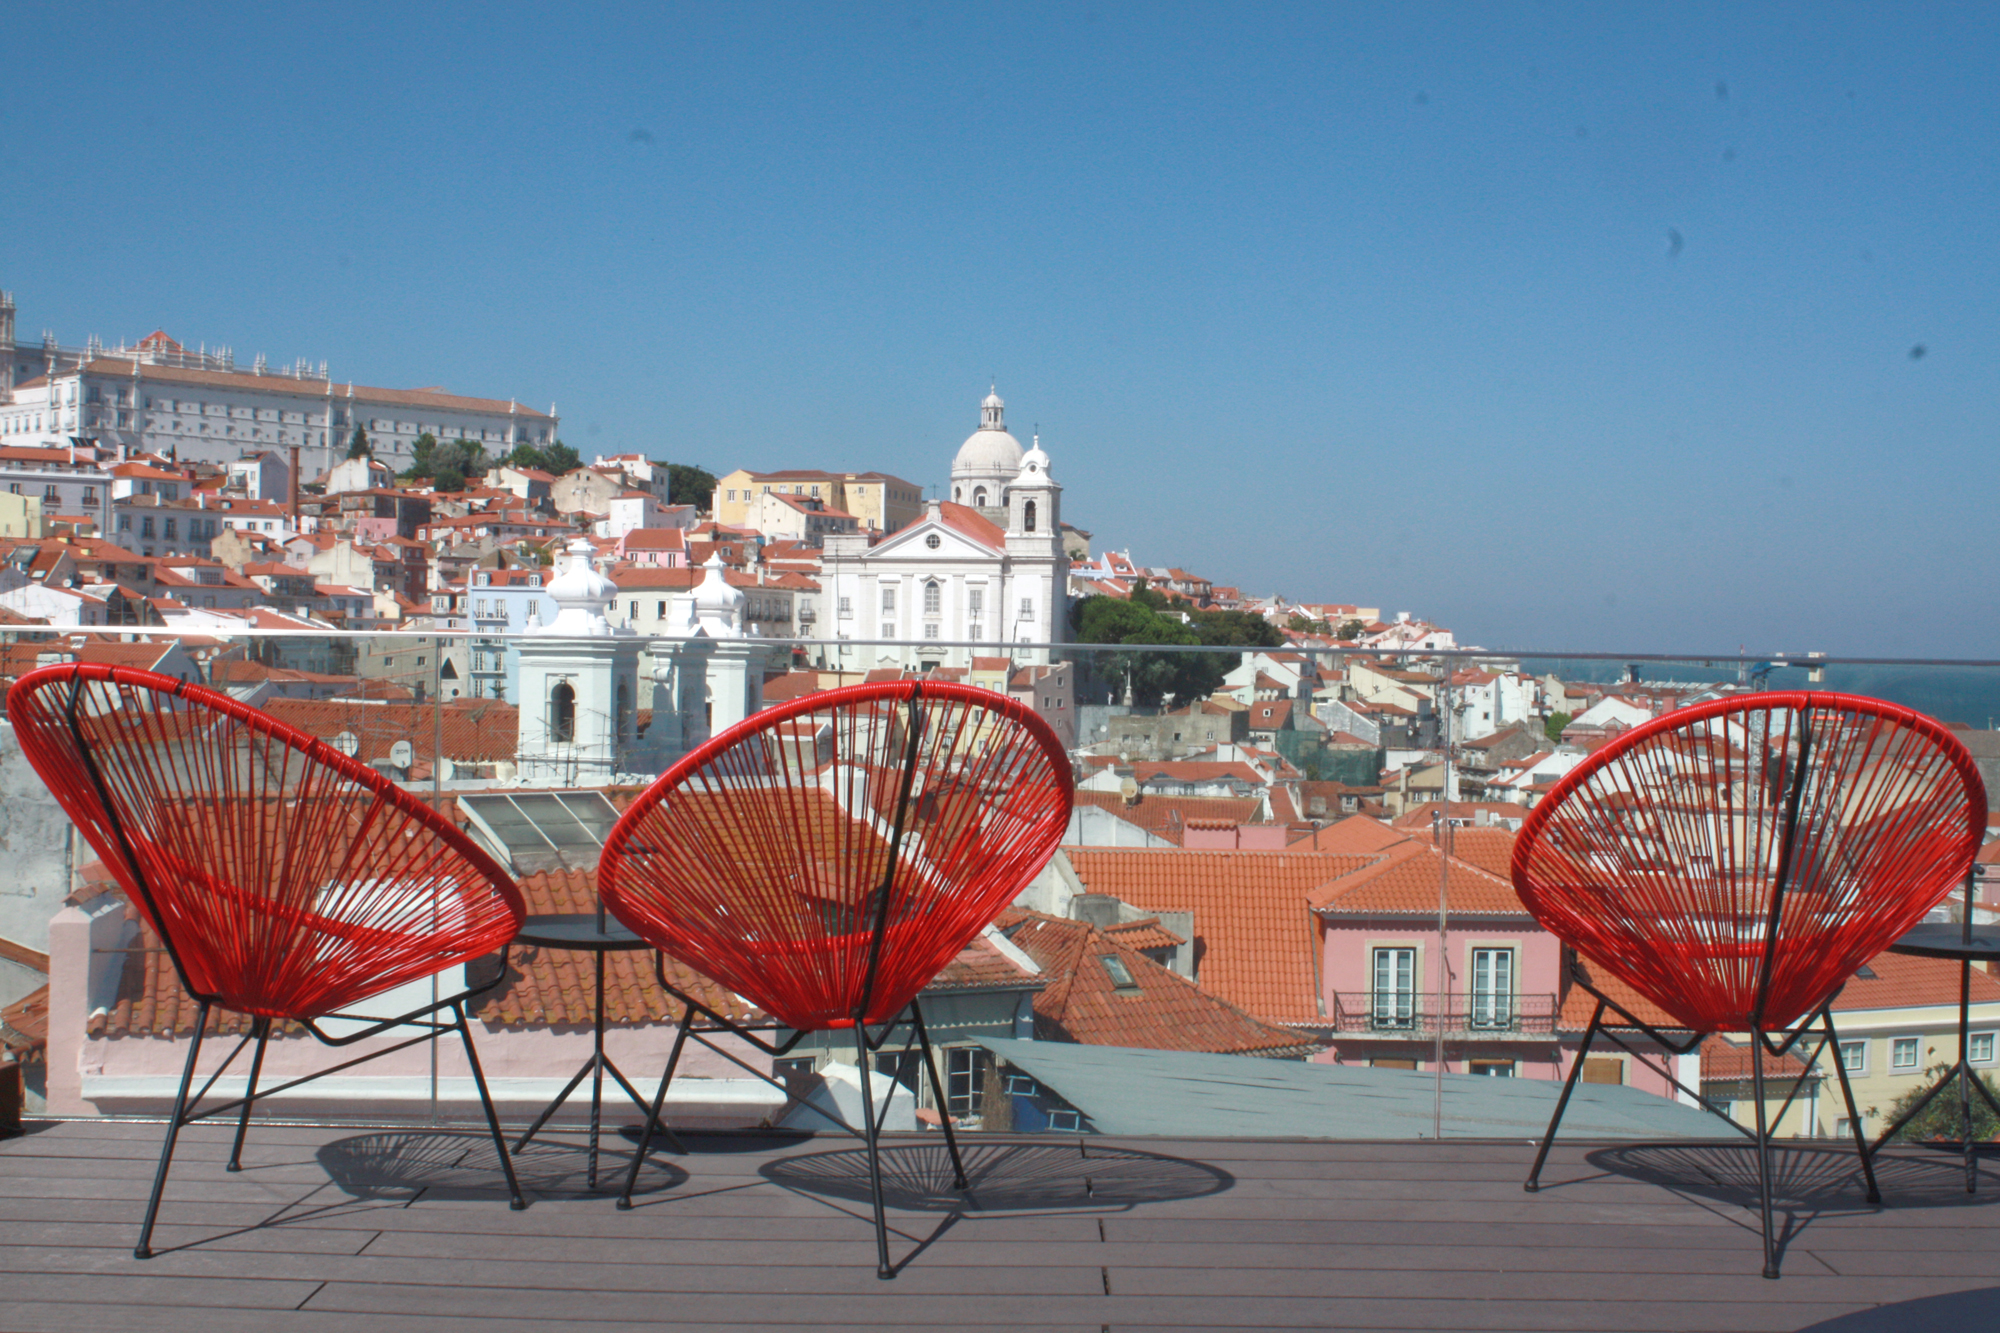 Lisbonne o dormir deedee for Appart hotel lisbonne